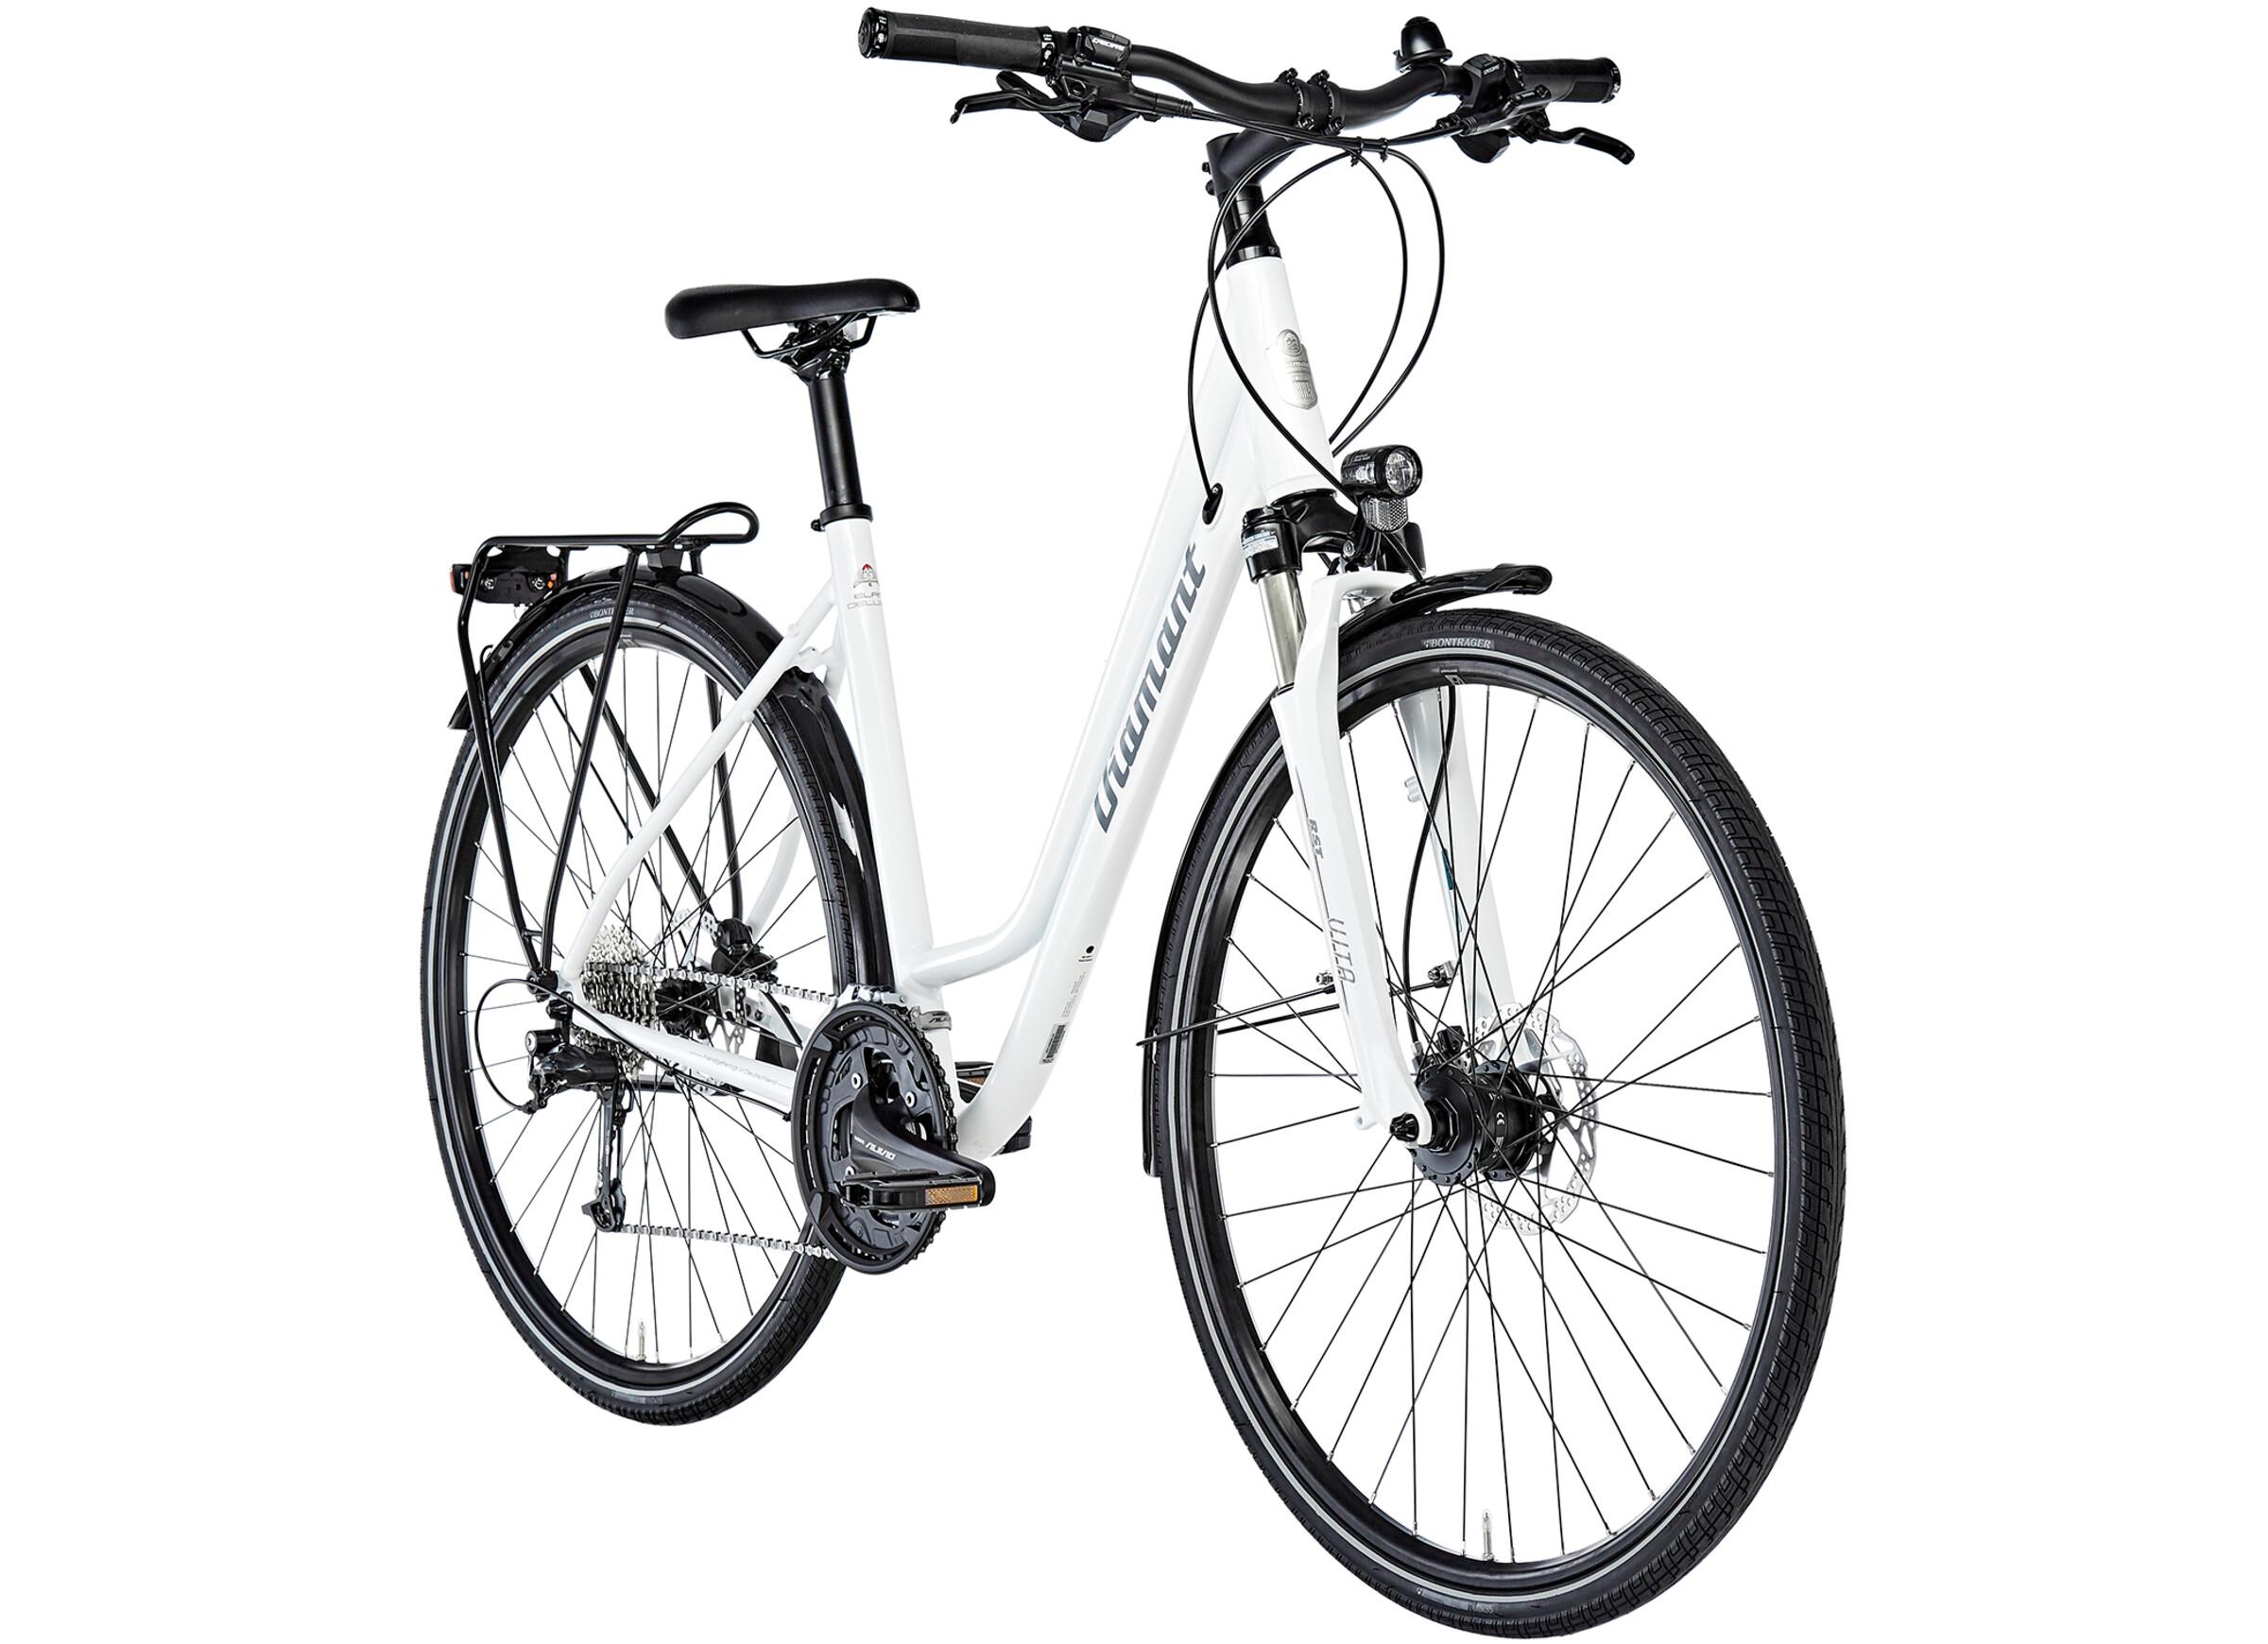 diamant elan deluxe touring bike cradle white at bikester. Black Bedroom Furniture Sets. Home Design Ideas